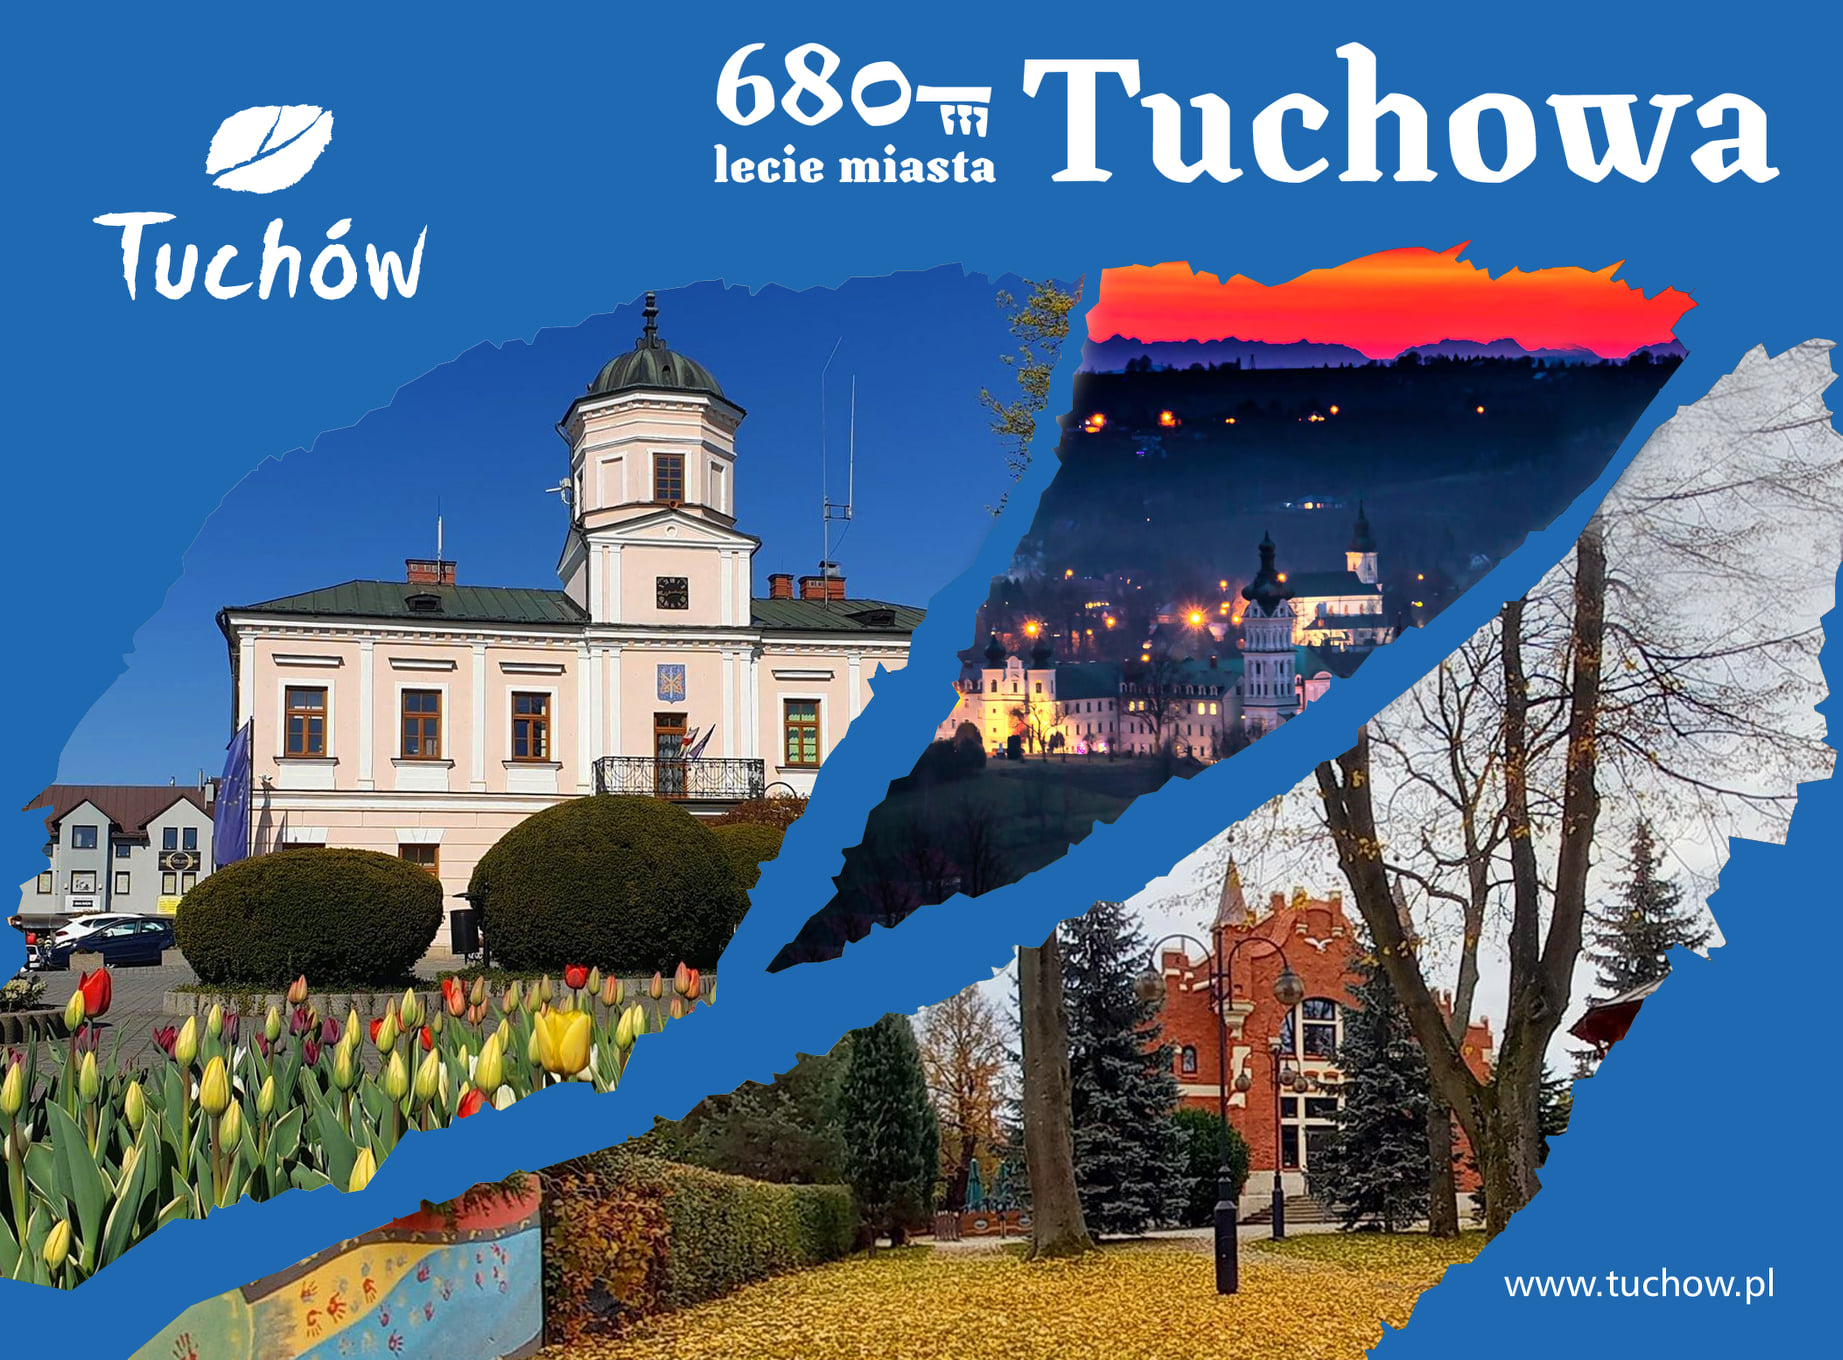 2.11.1340 r. – 2.11.2020 r. – 680 lat Tuchowa!